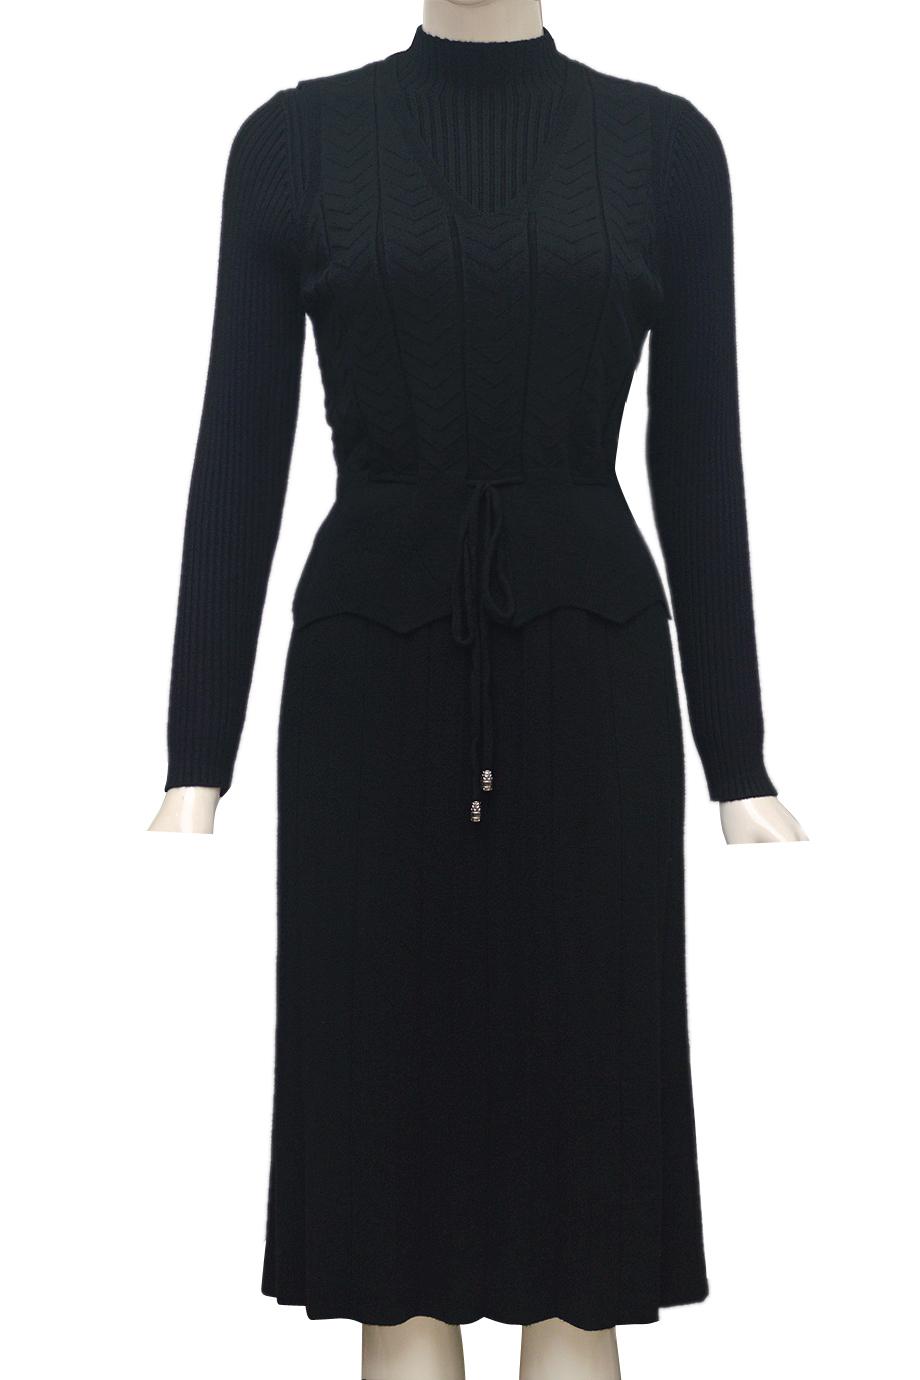 Váy len cặp thời trang ELMI cao cấp màu đen EV46